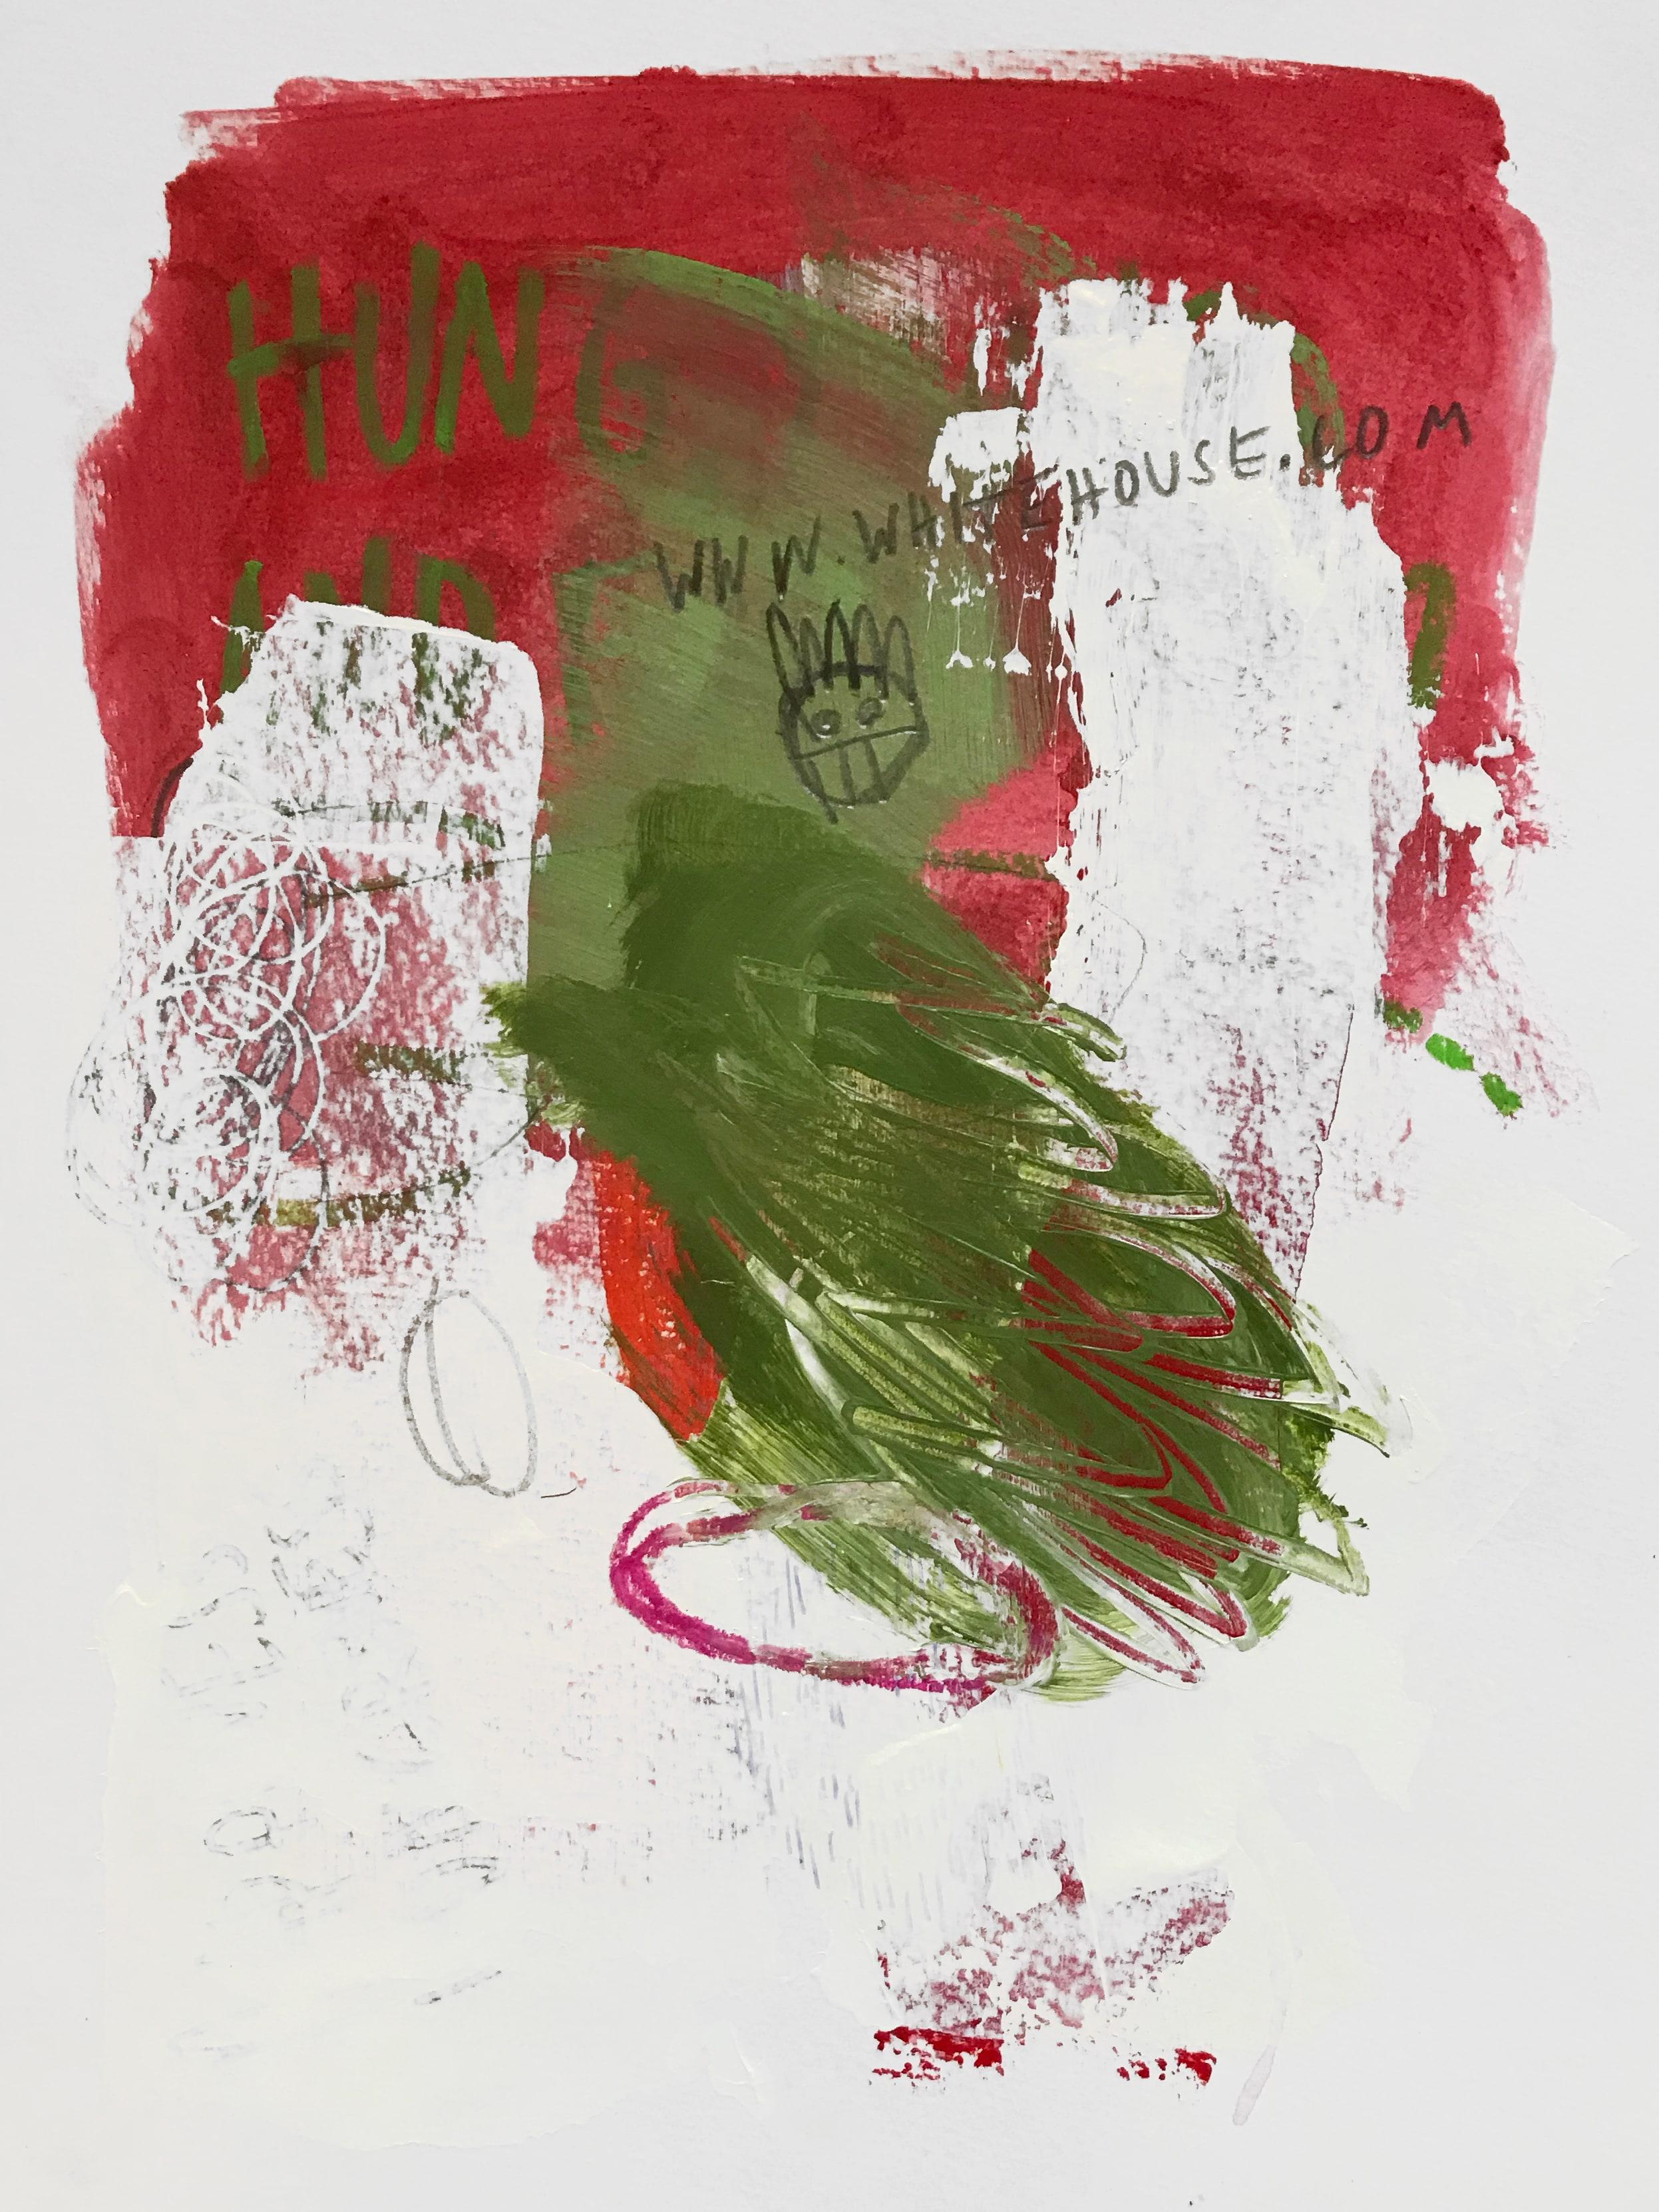 whitehouse.com  Acrylic, graphite, oil pastel on paper 24 x 32 cm